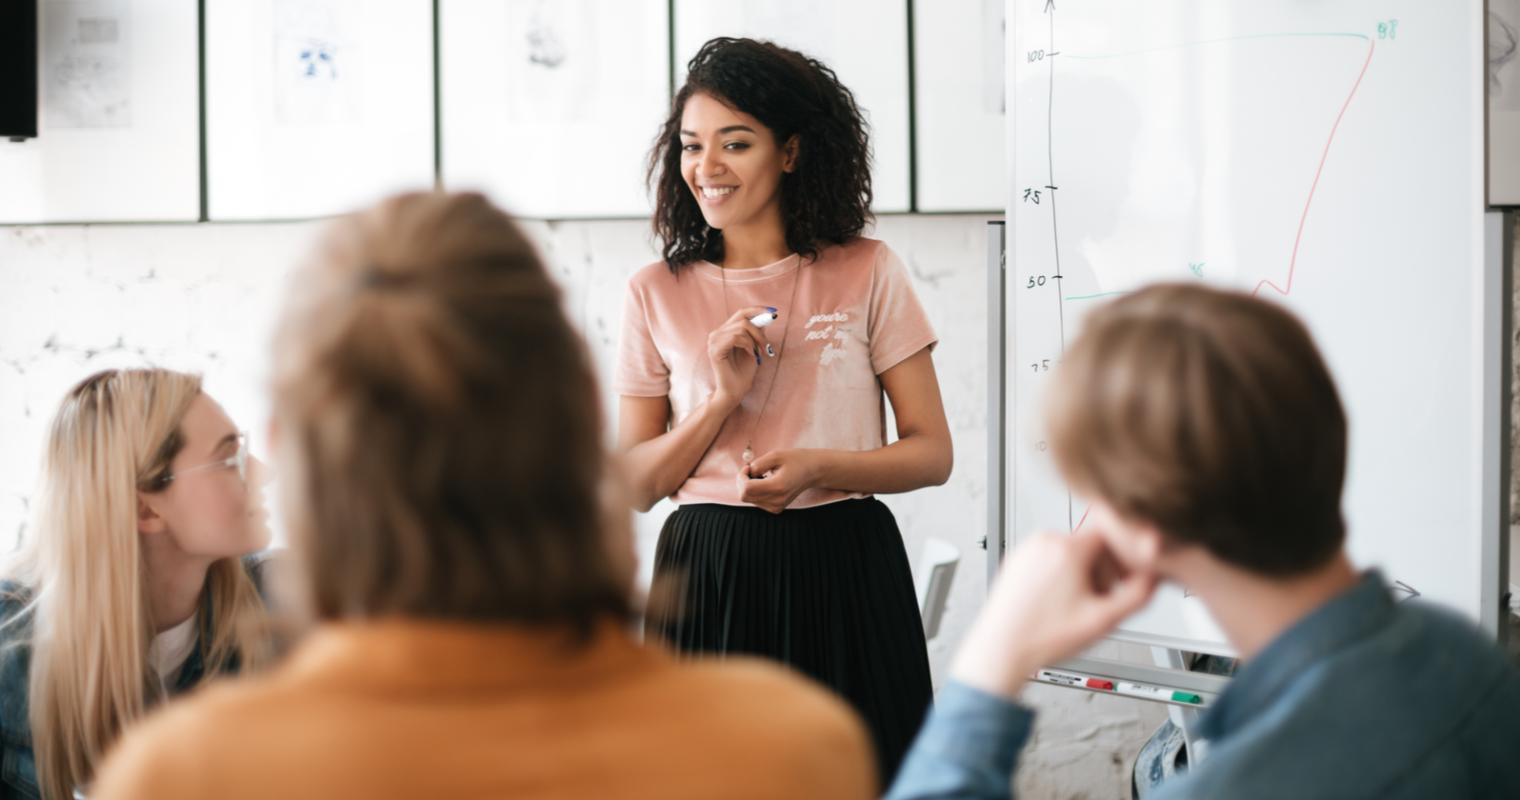 5 Ways to Improve Your Public Speaking Skills